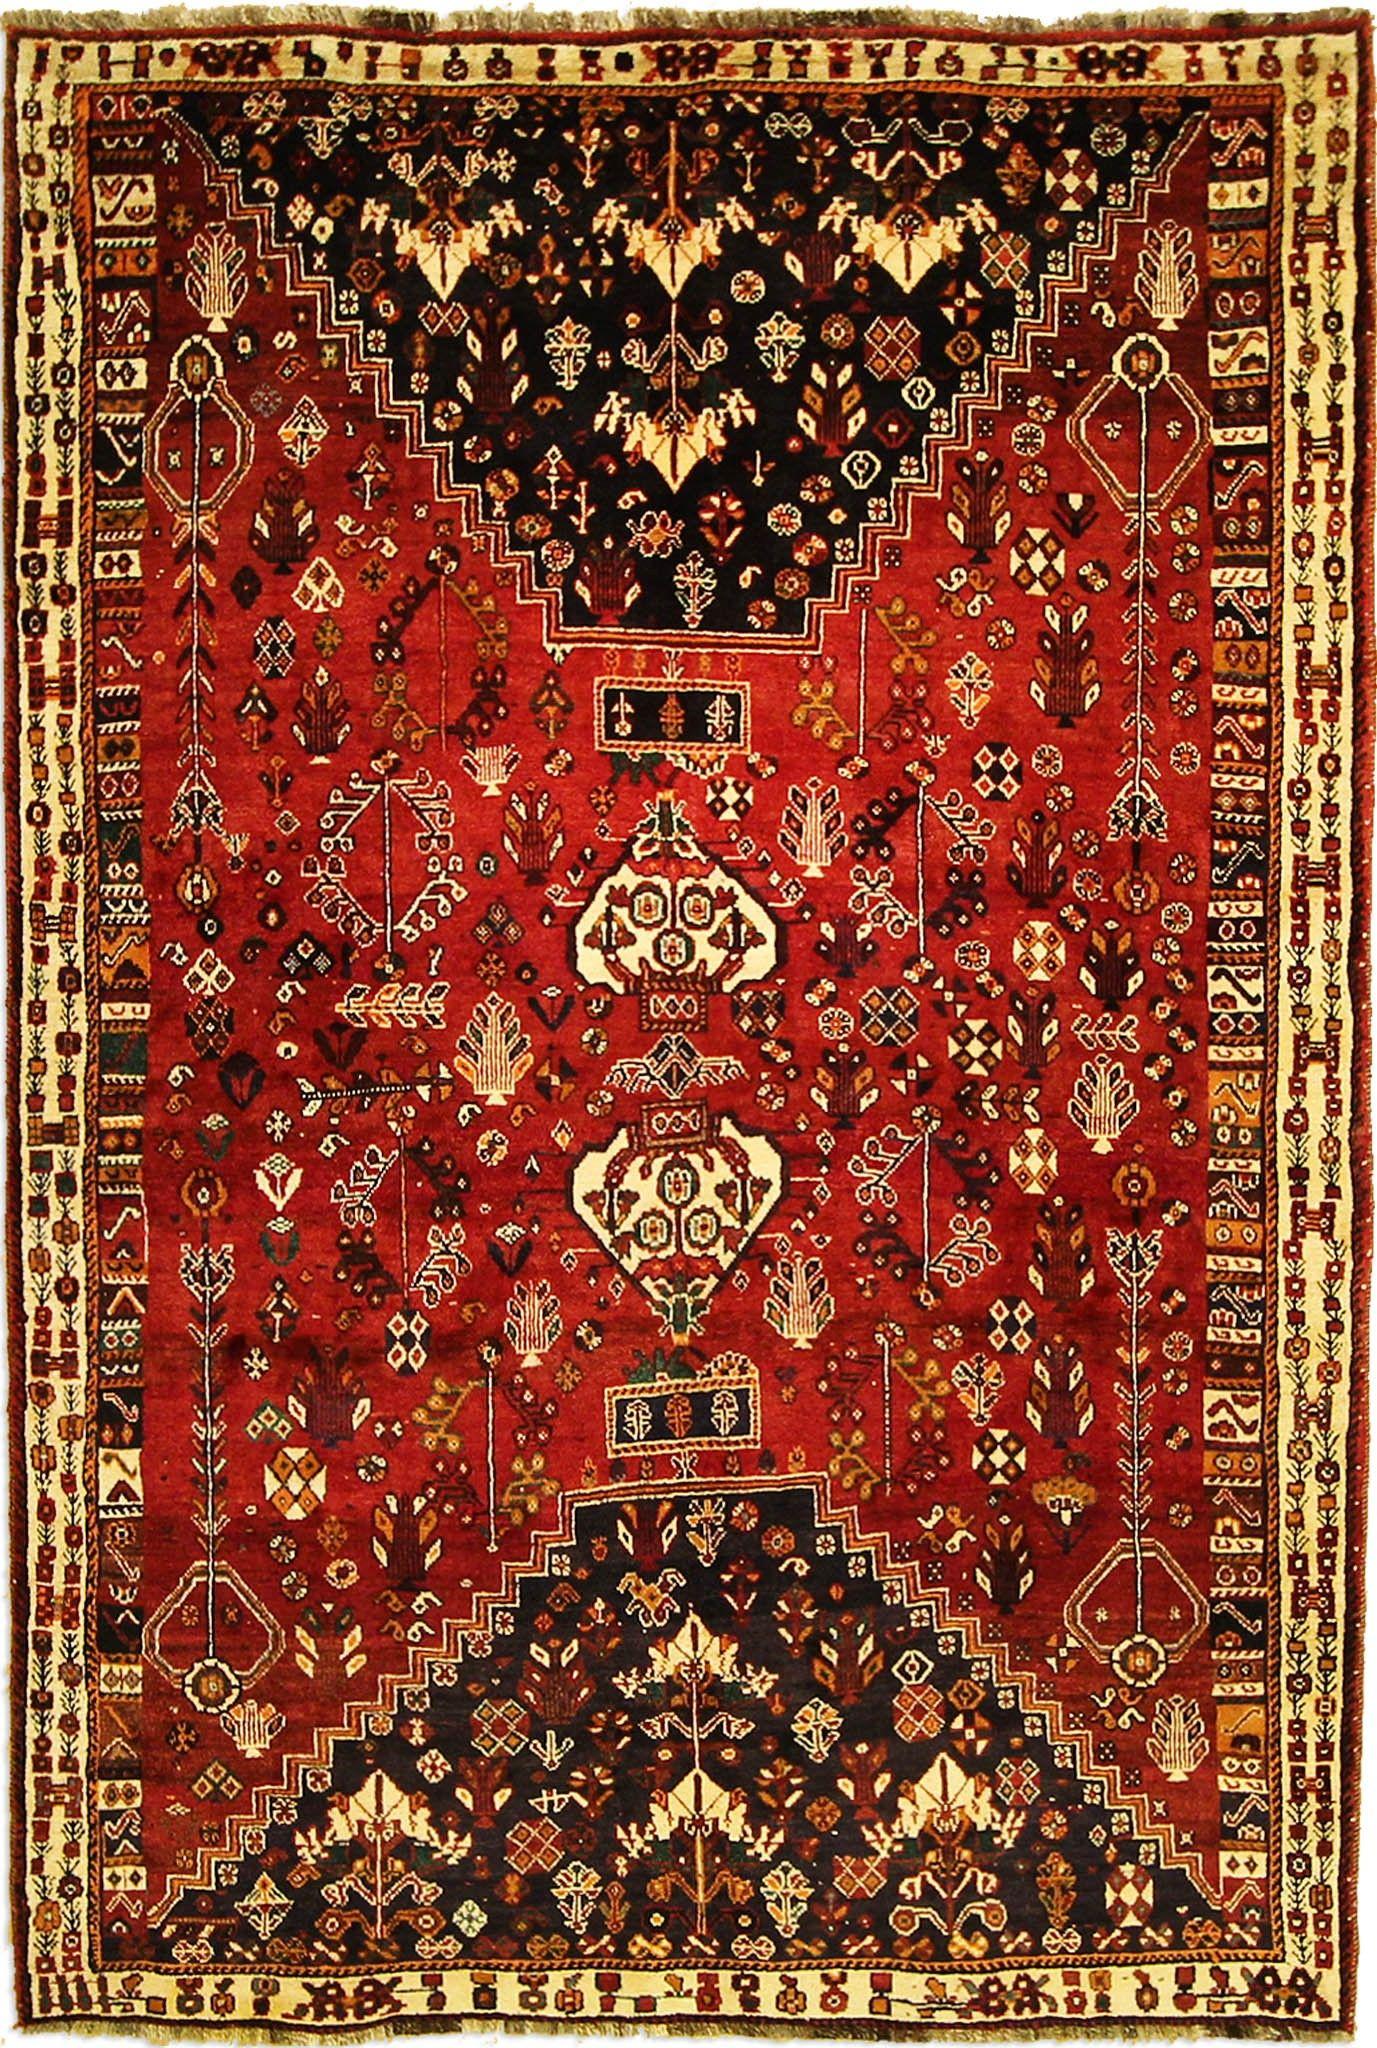 Oriental Qashqai Rug 257 X 172 Cm 8 43 X 5 64 Ft Persian Tribal Carpet Rugs On Carpet Tribal Rug